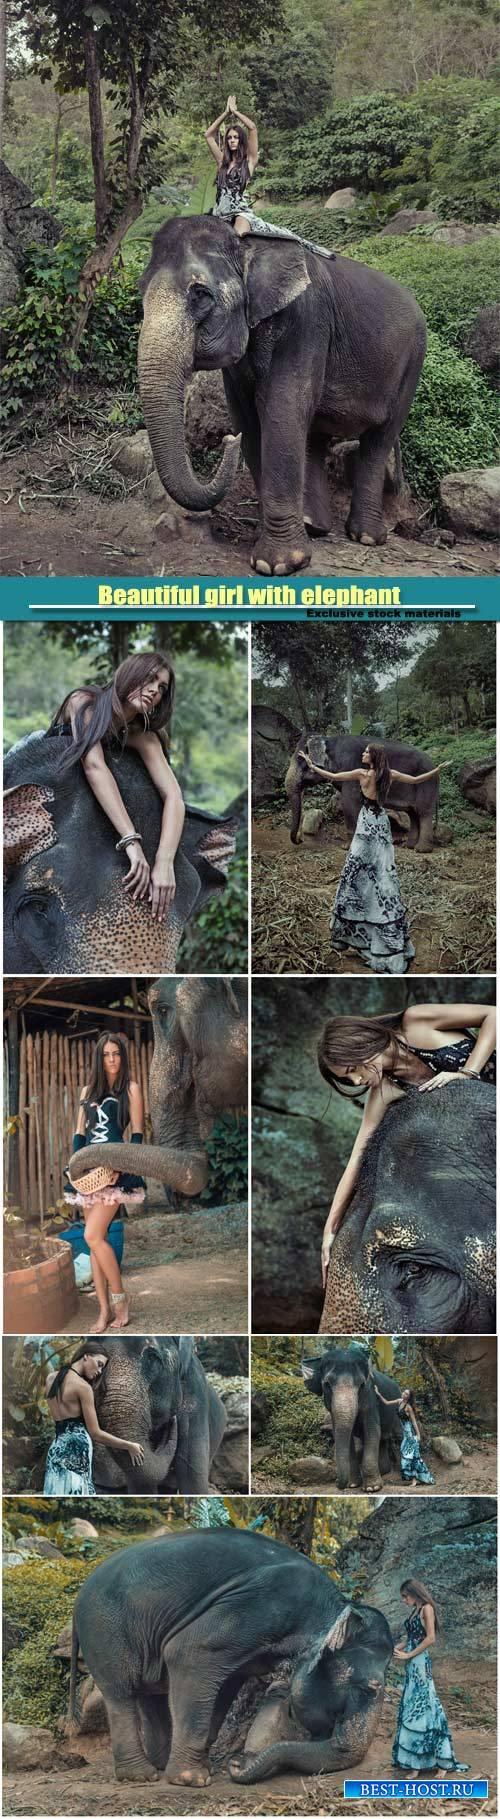 Beautiful girl with elephant